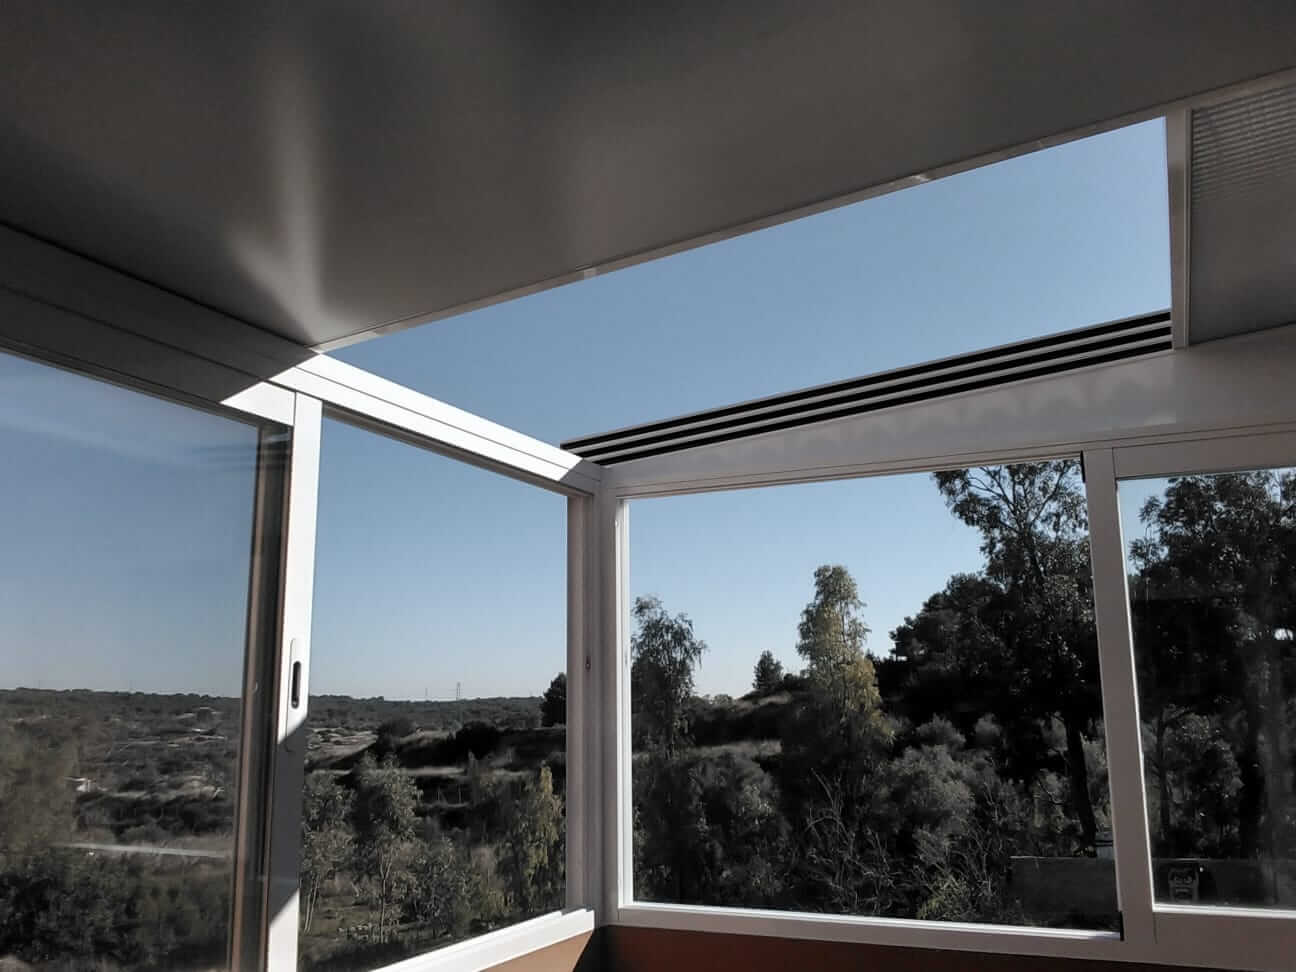 Cerramiento acristalado en balcón exterior, con techo abatible.